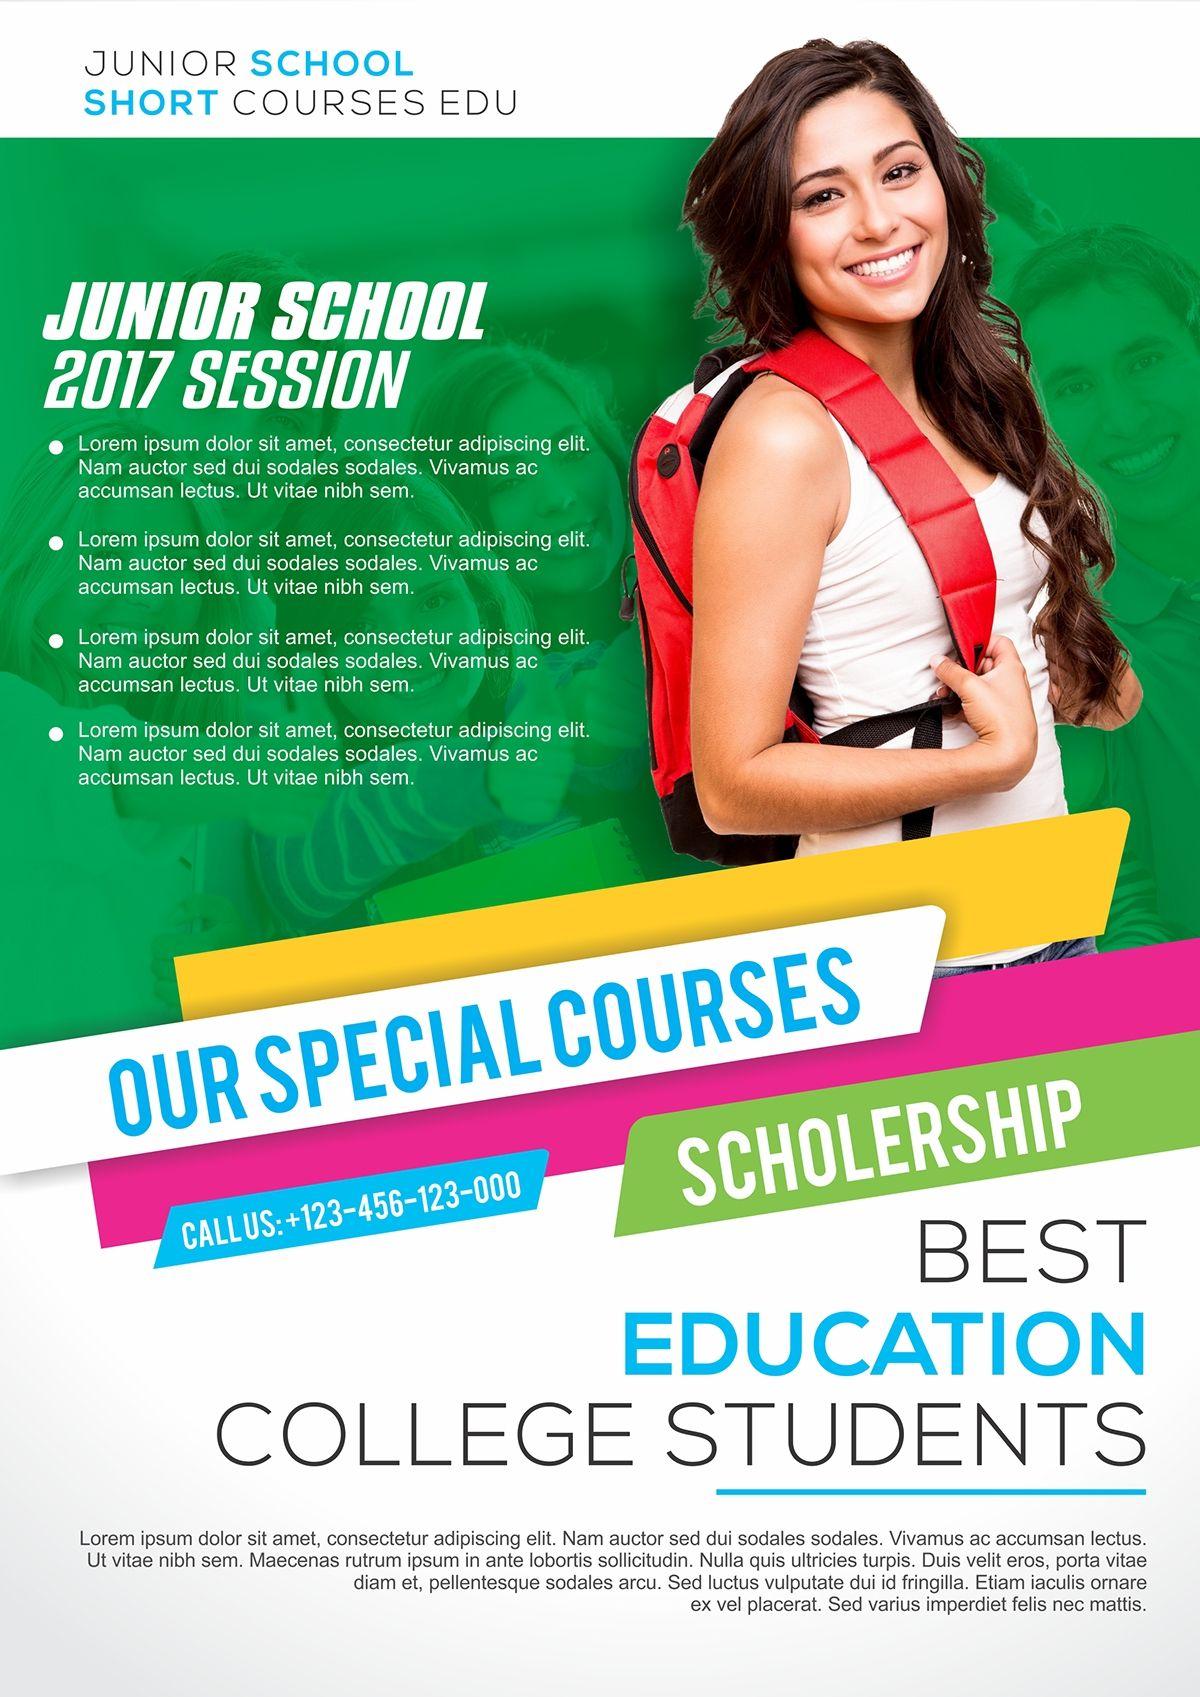 School Flyer A4 Size On Behance Pamphlet Design Graphic Design Ads Education Poster Design